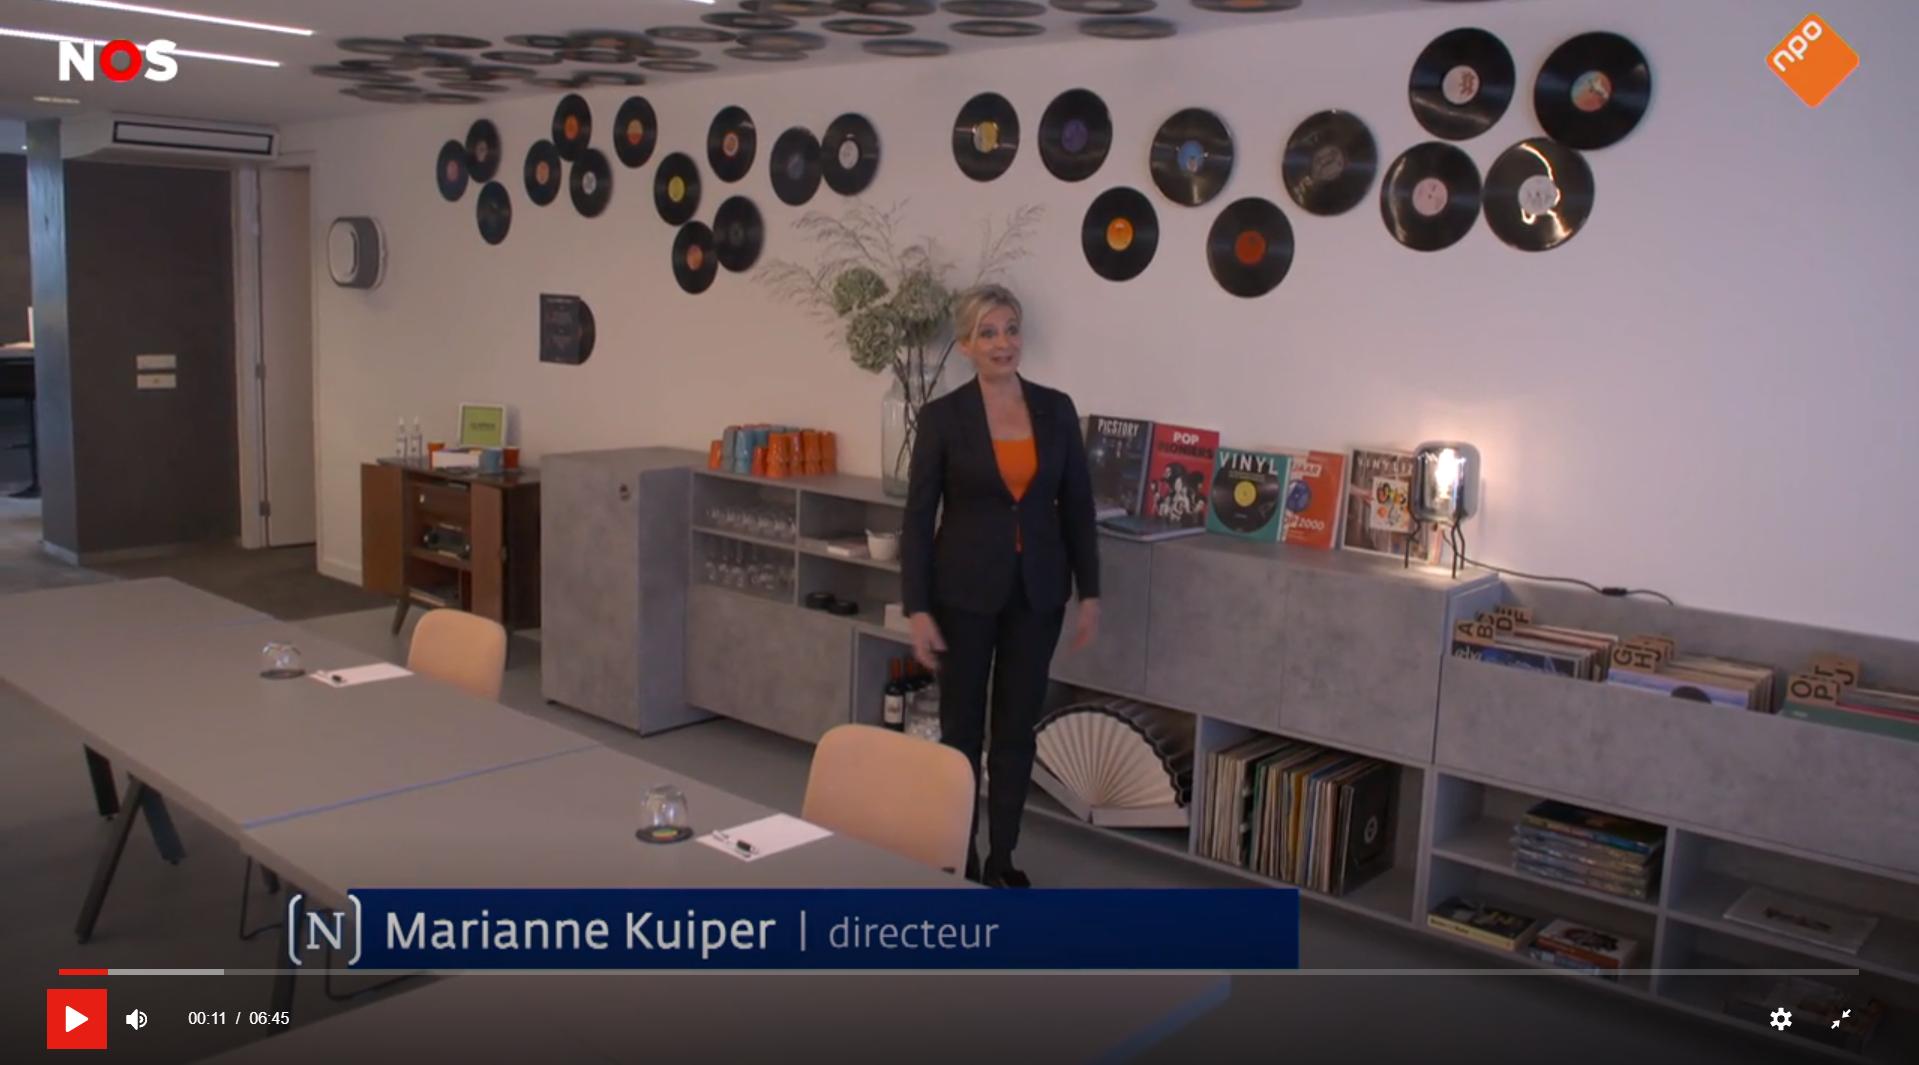 Nieuwsuur   Leidinggeven in de coronacrisis   Efficient Hotel Partner   Music Meeting Lounge   Marianne Kuiper  